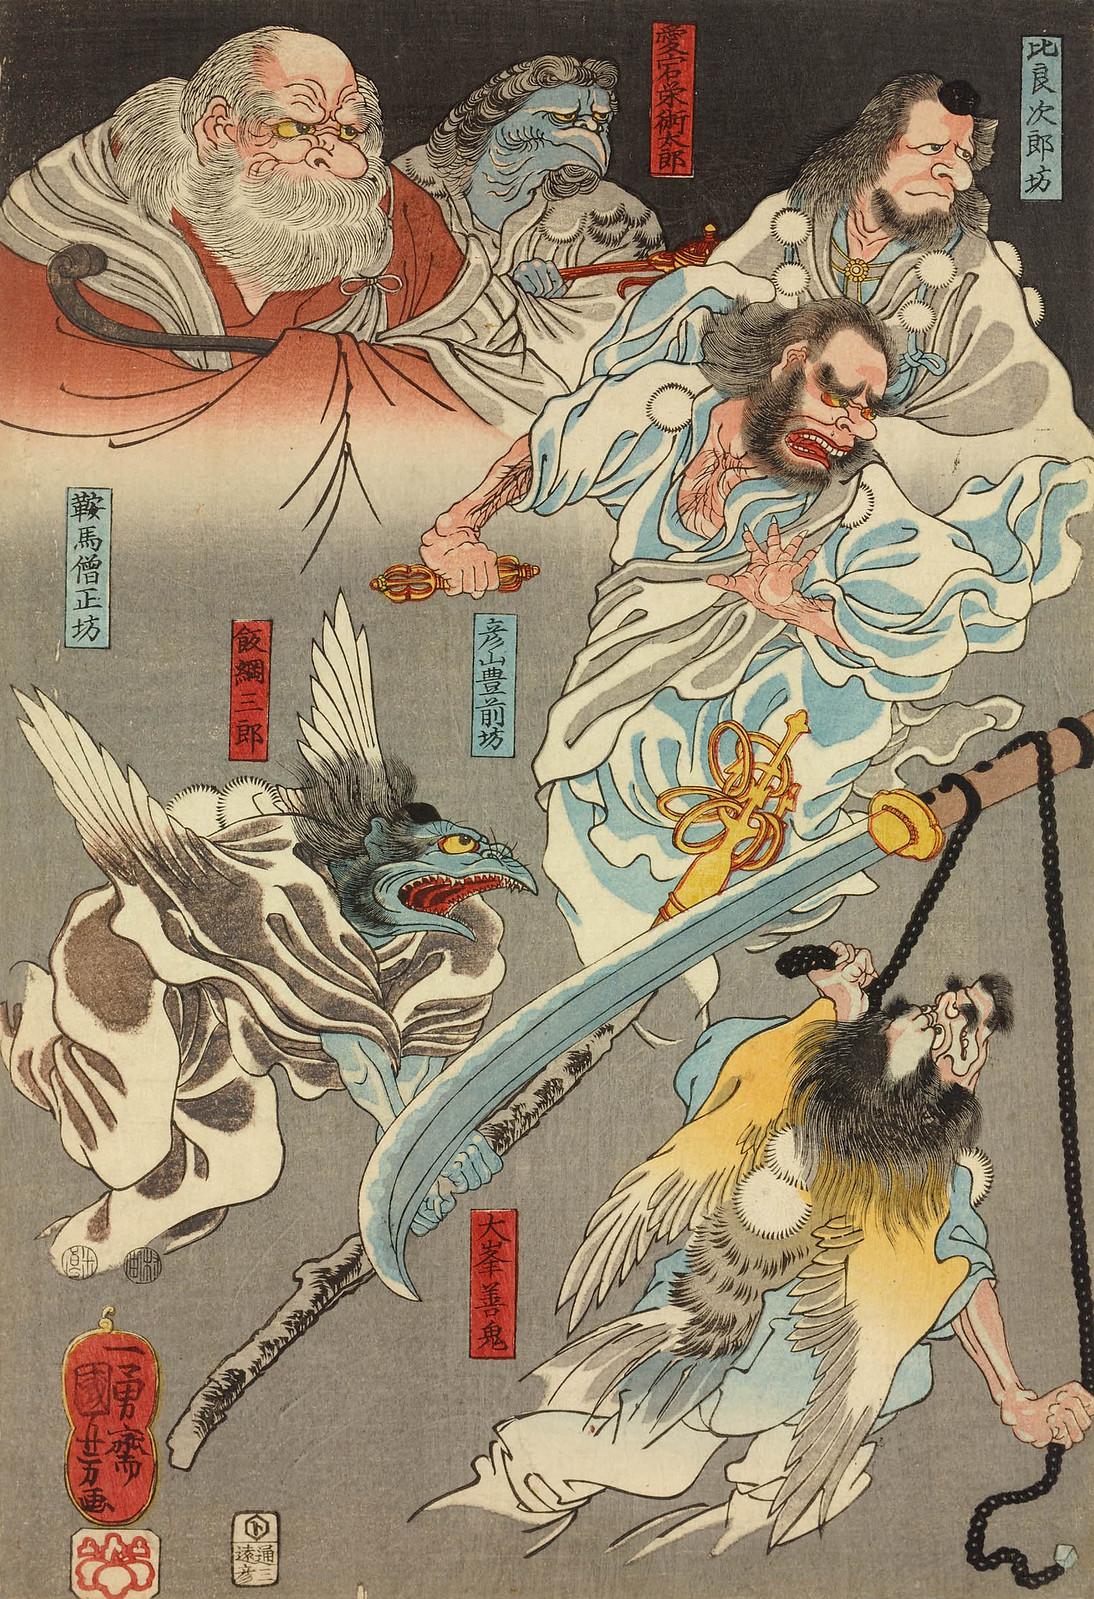 Utagawa Kuniyoshi - Ushiwakamaru (Yoshitsune) Fighting Benkei with the Help of the Tengu, 1847-50 (middle panel)